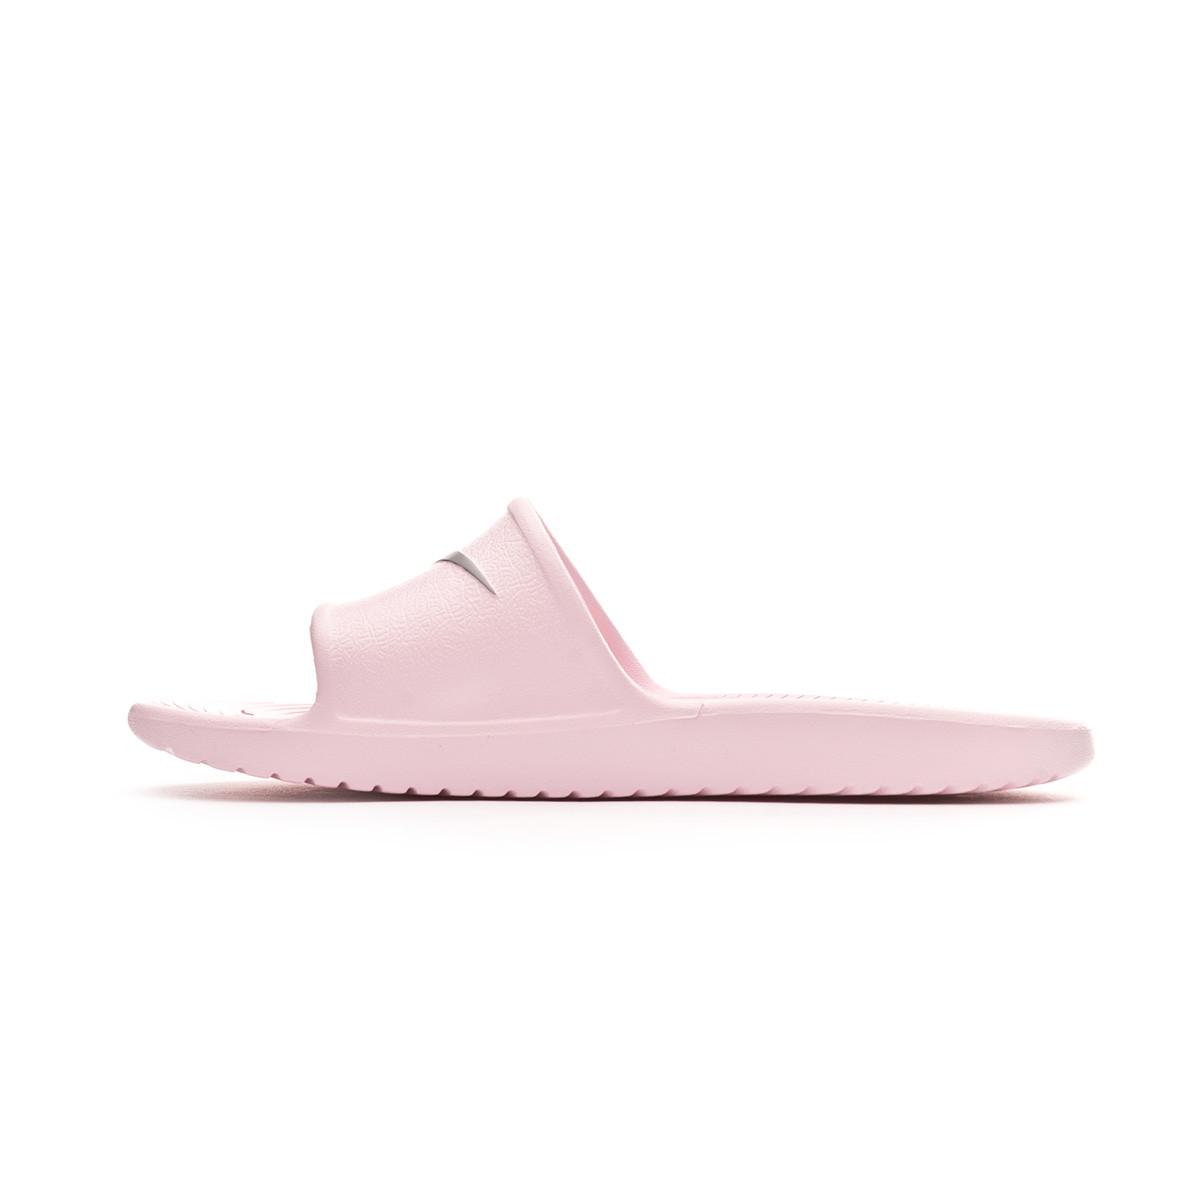 Sandal Nike Chanclas Kawa Shower Mujer nP8wk0O